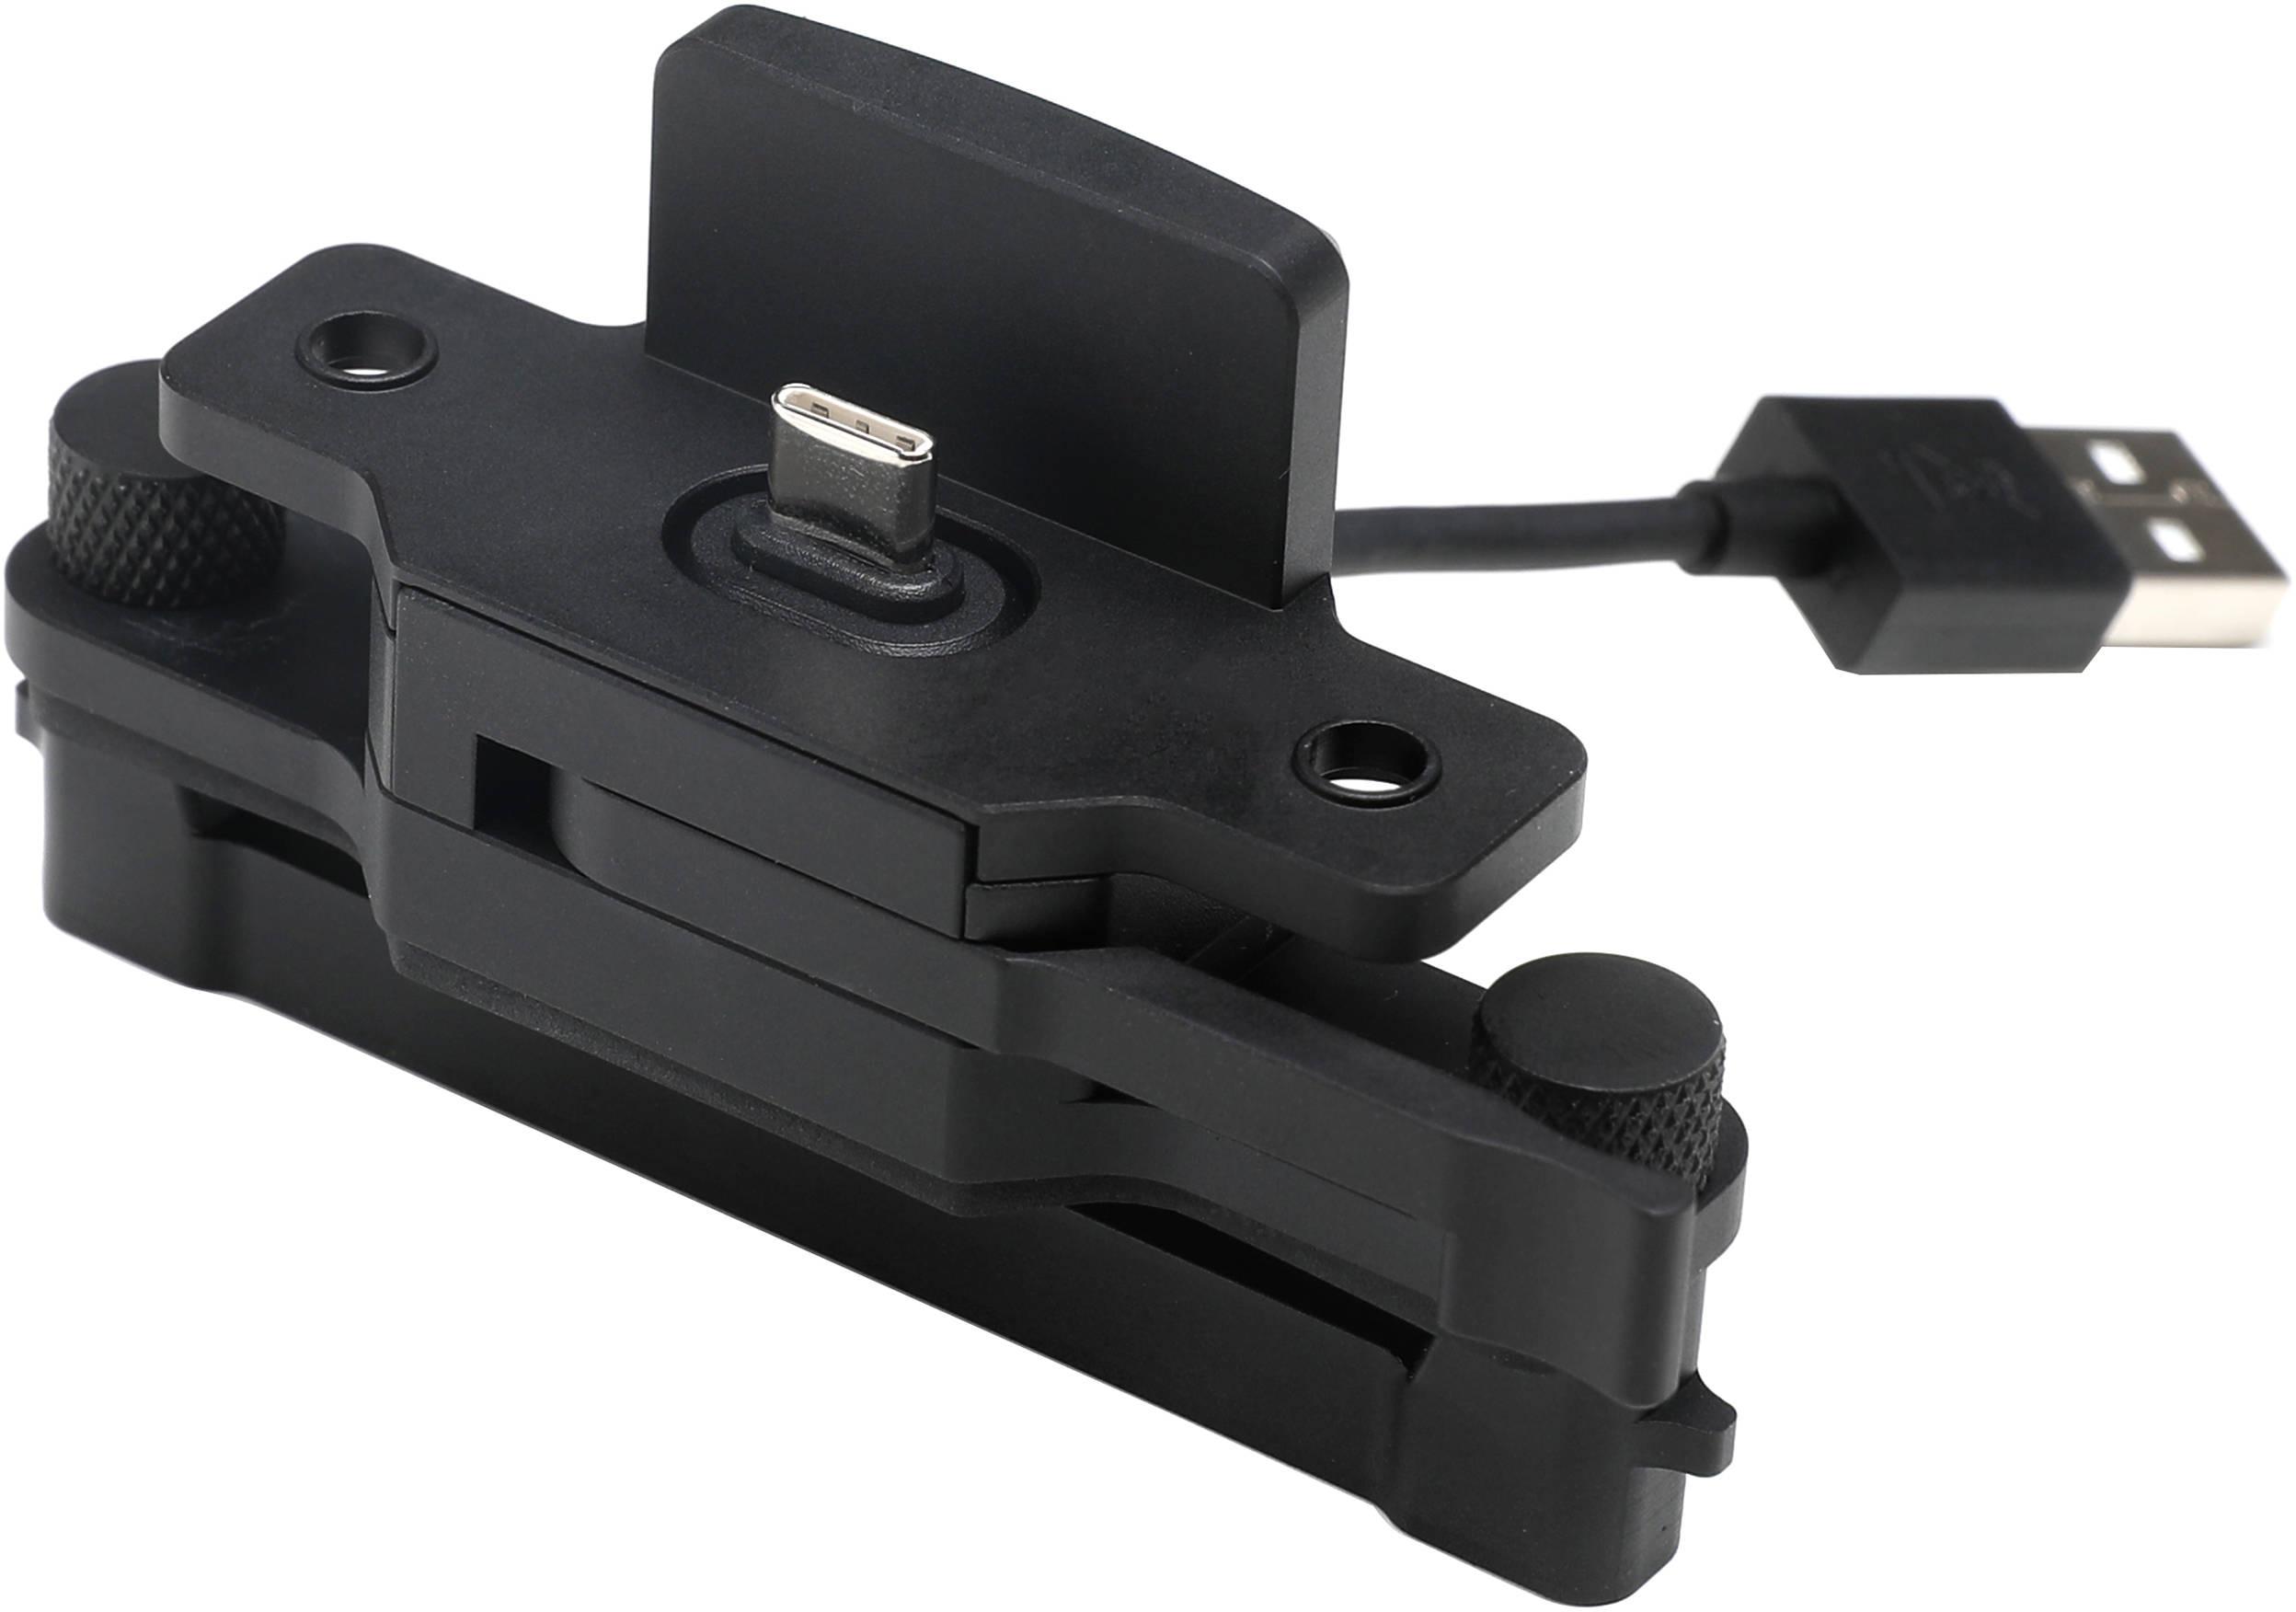 Крепежный кронштейн CrystalSky для Mavic/Spark Remote Controller Mounting Bracket-2